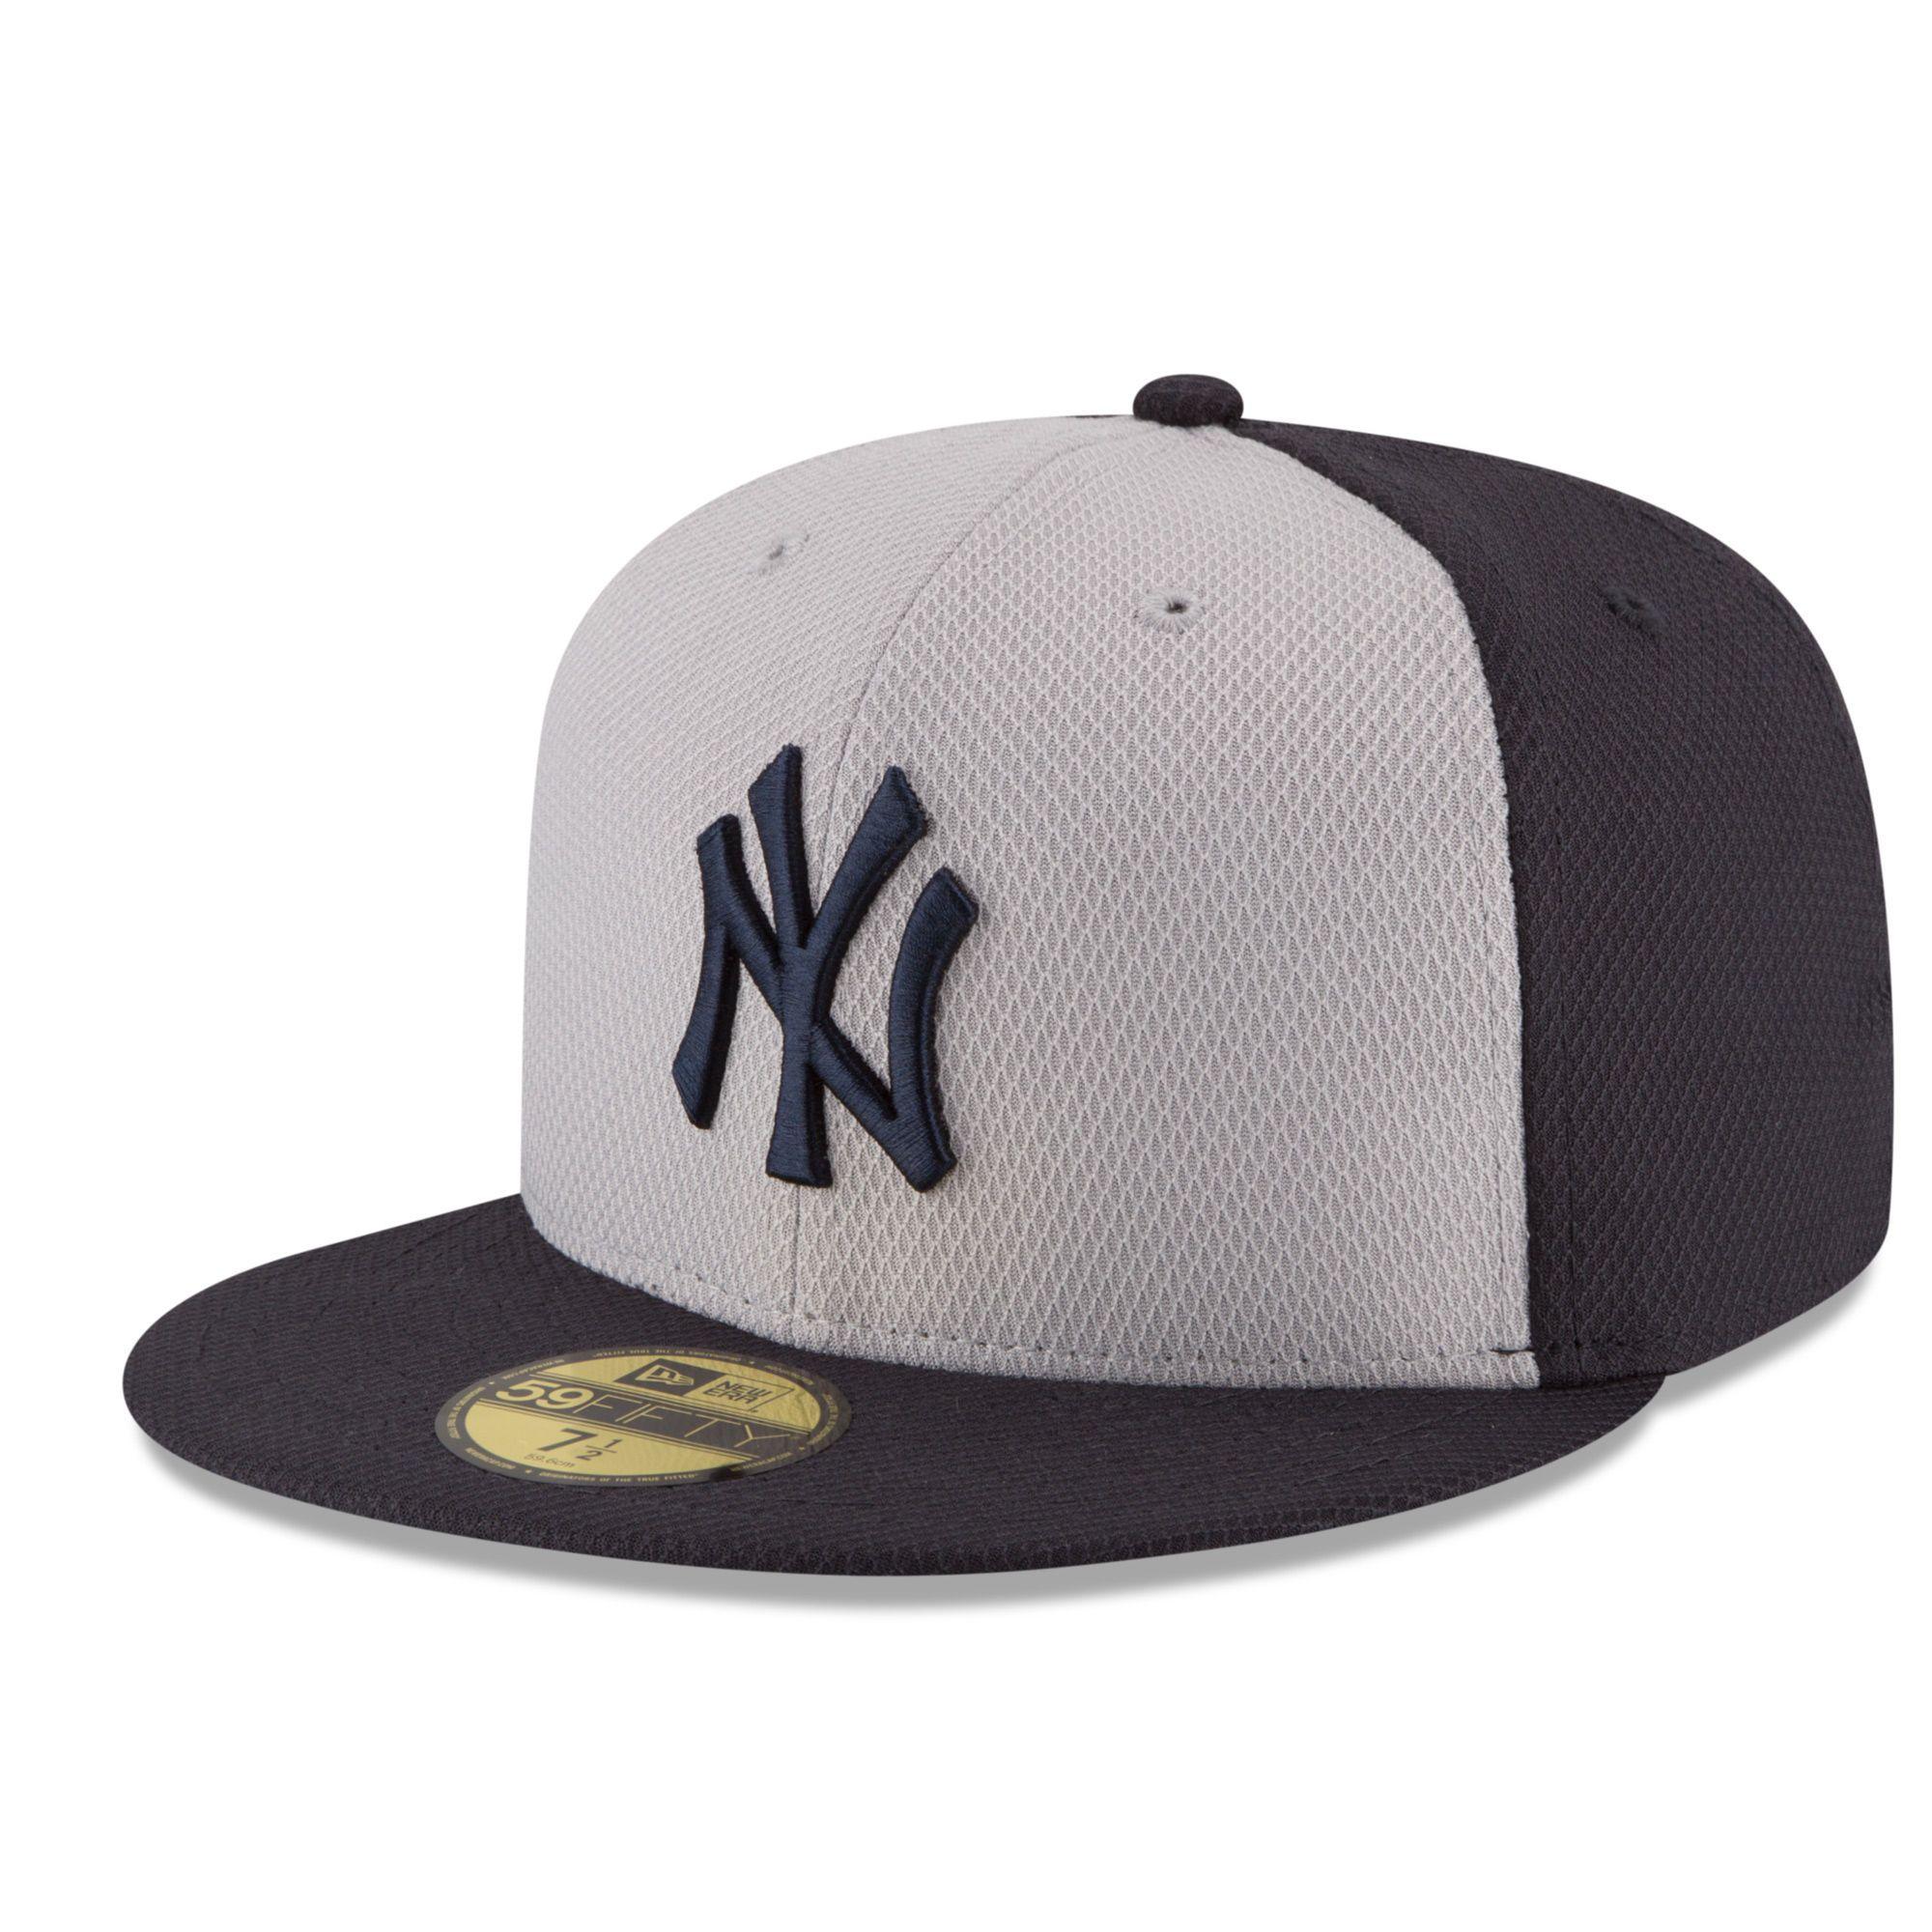 New York Yankees New Era Road Diamond Era 59fifty Fitted Hat Navy Gray Fitted Hats New Era Yankees Yankees Hat